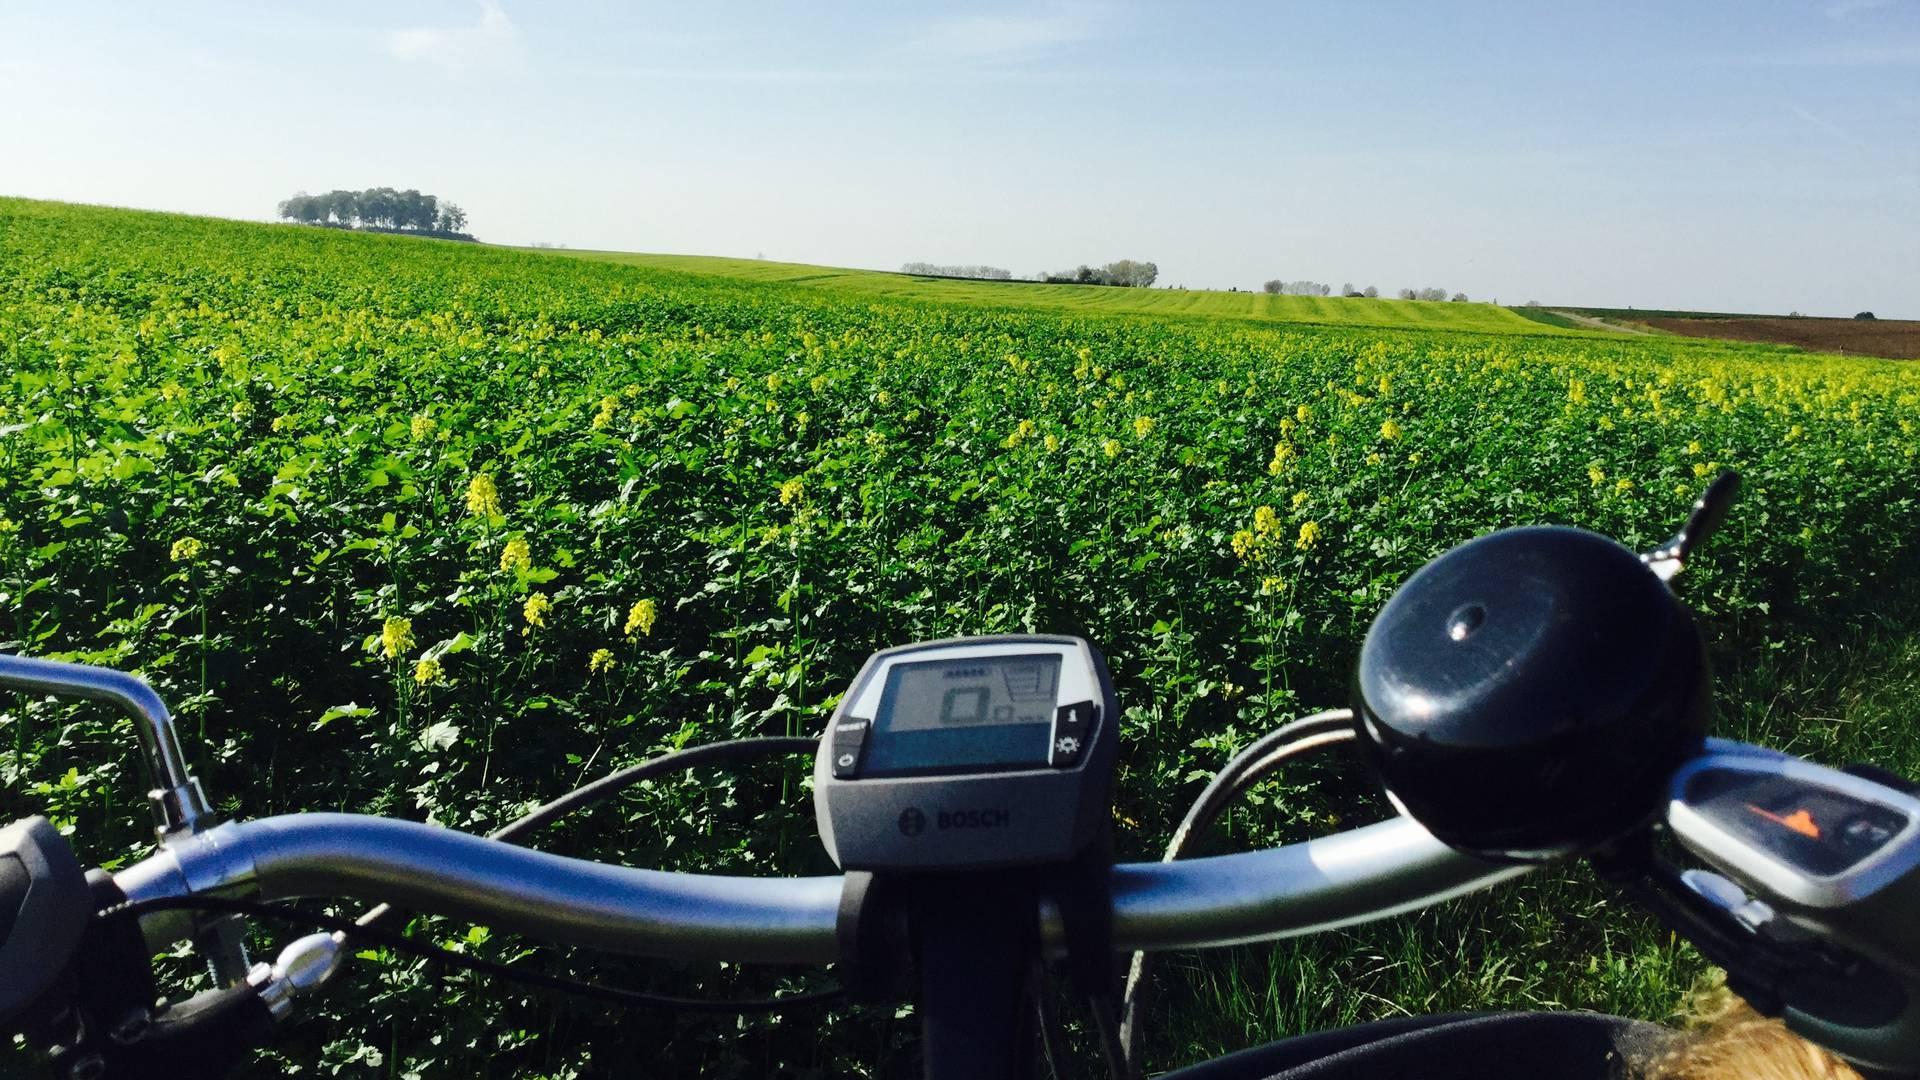 Vélo en Hesbaye - copyright GAL Jesuishesbignon.be